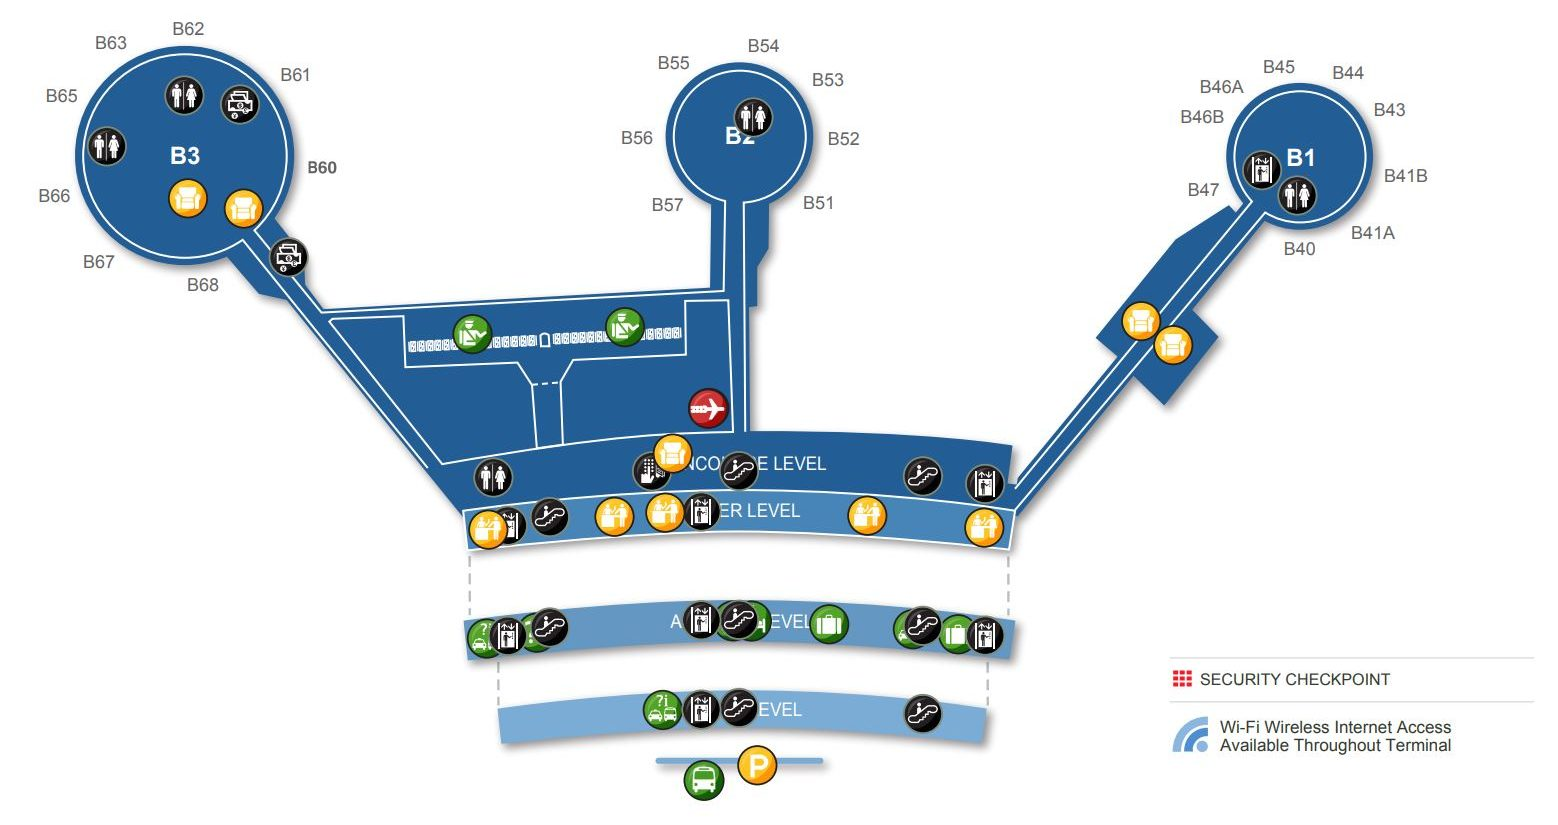 ewr map terminal a Newark Liberty International Airport Ewr Terminal Guide 2020 ewr map terminal a